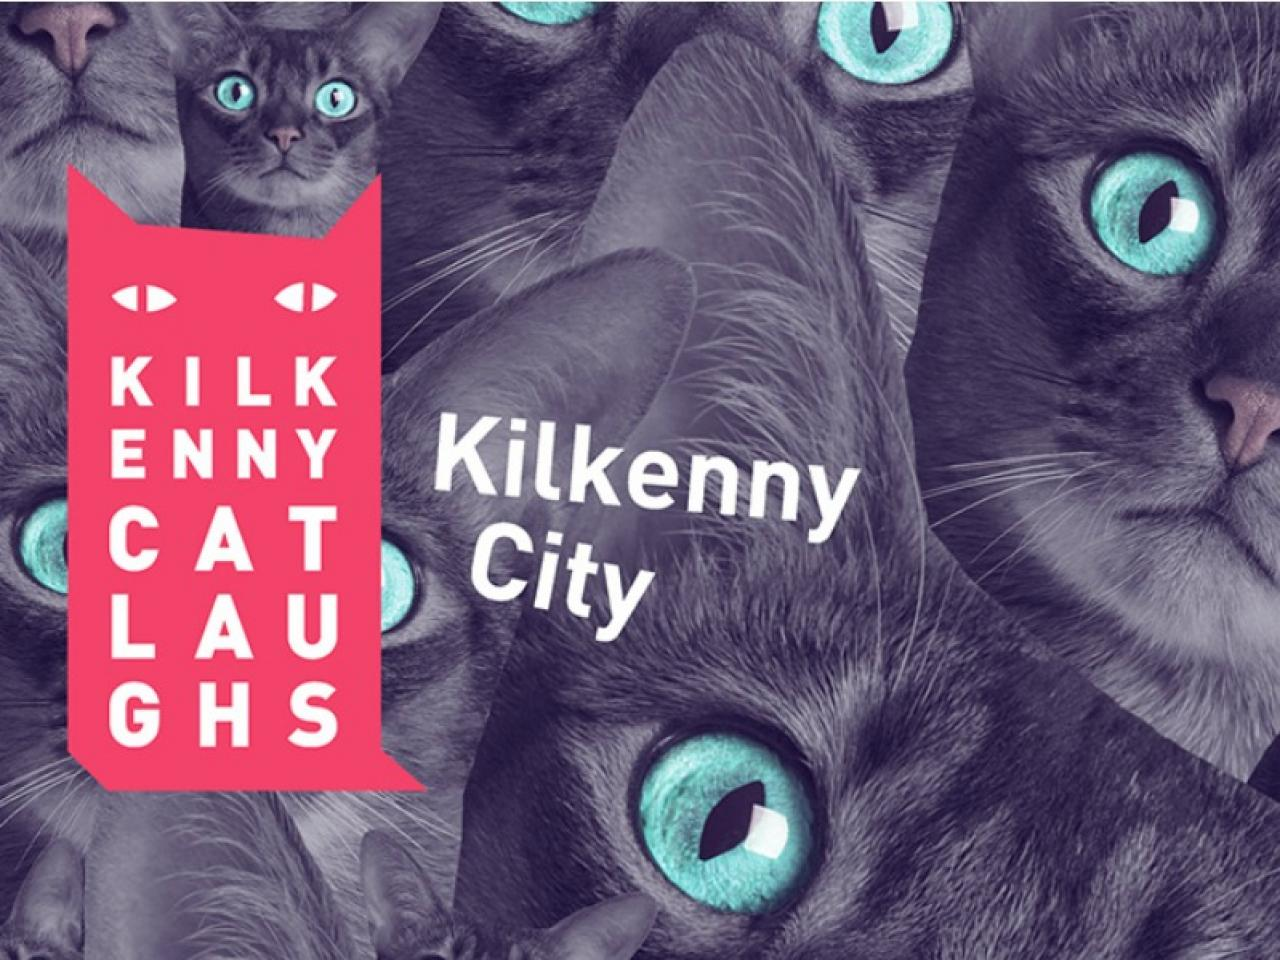 Kilkenny Cat Laughs